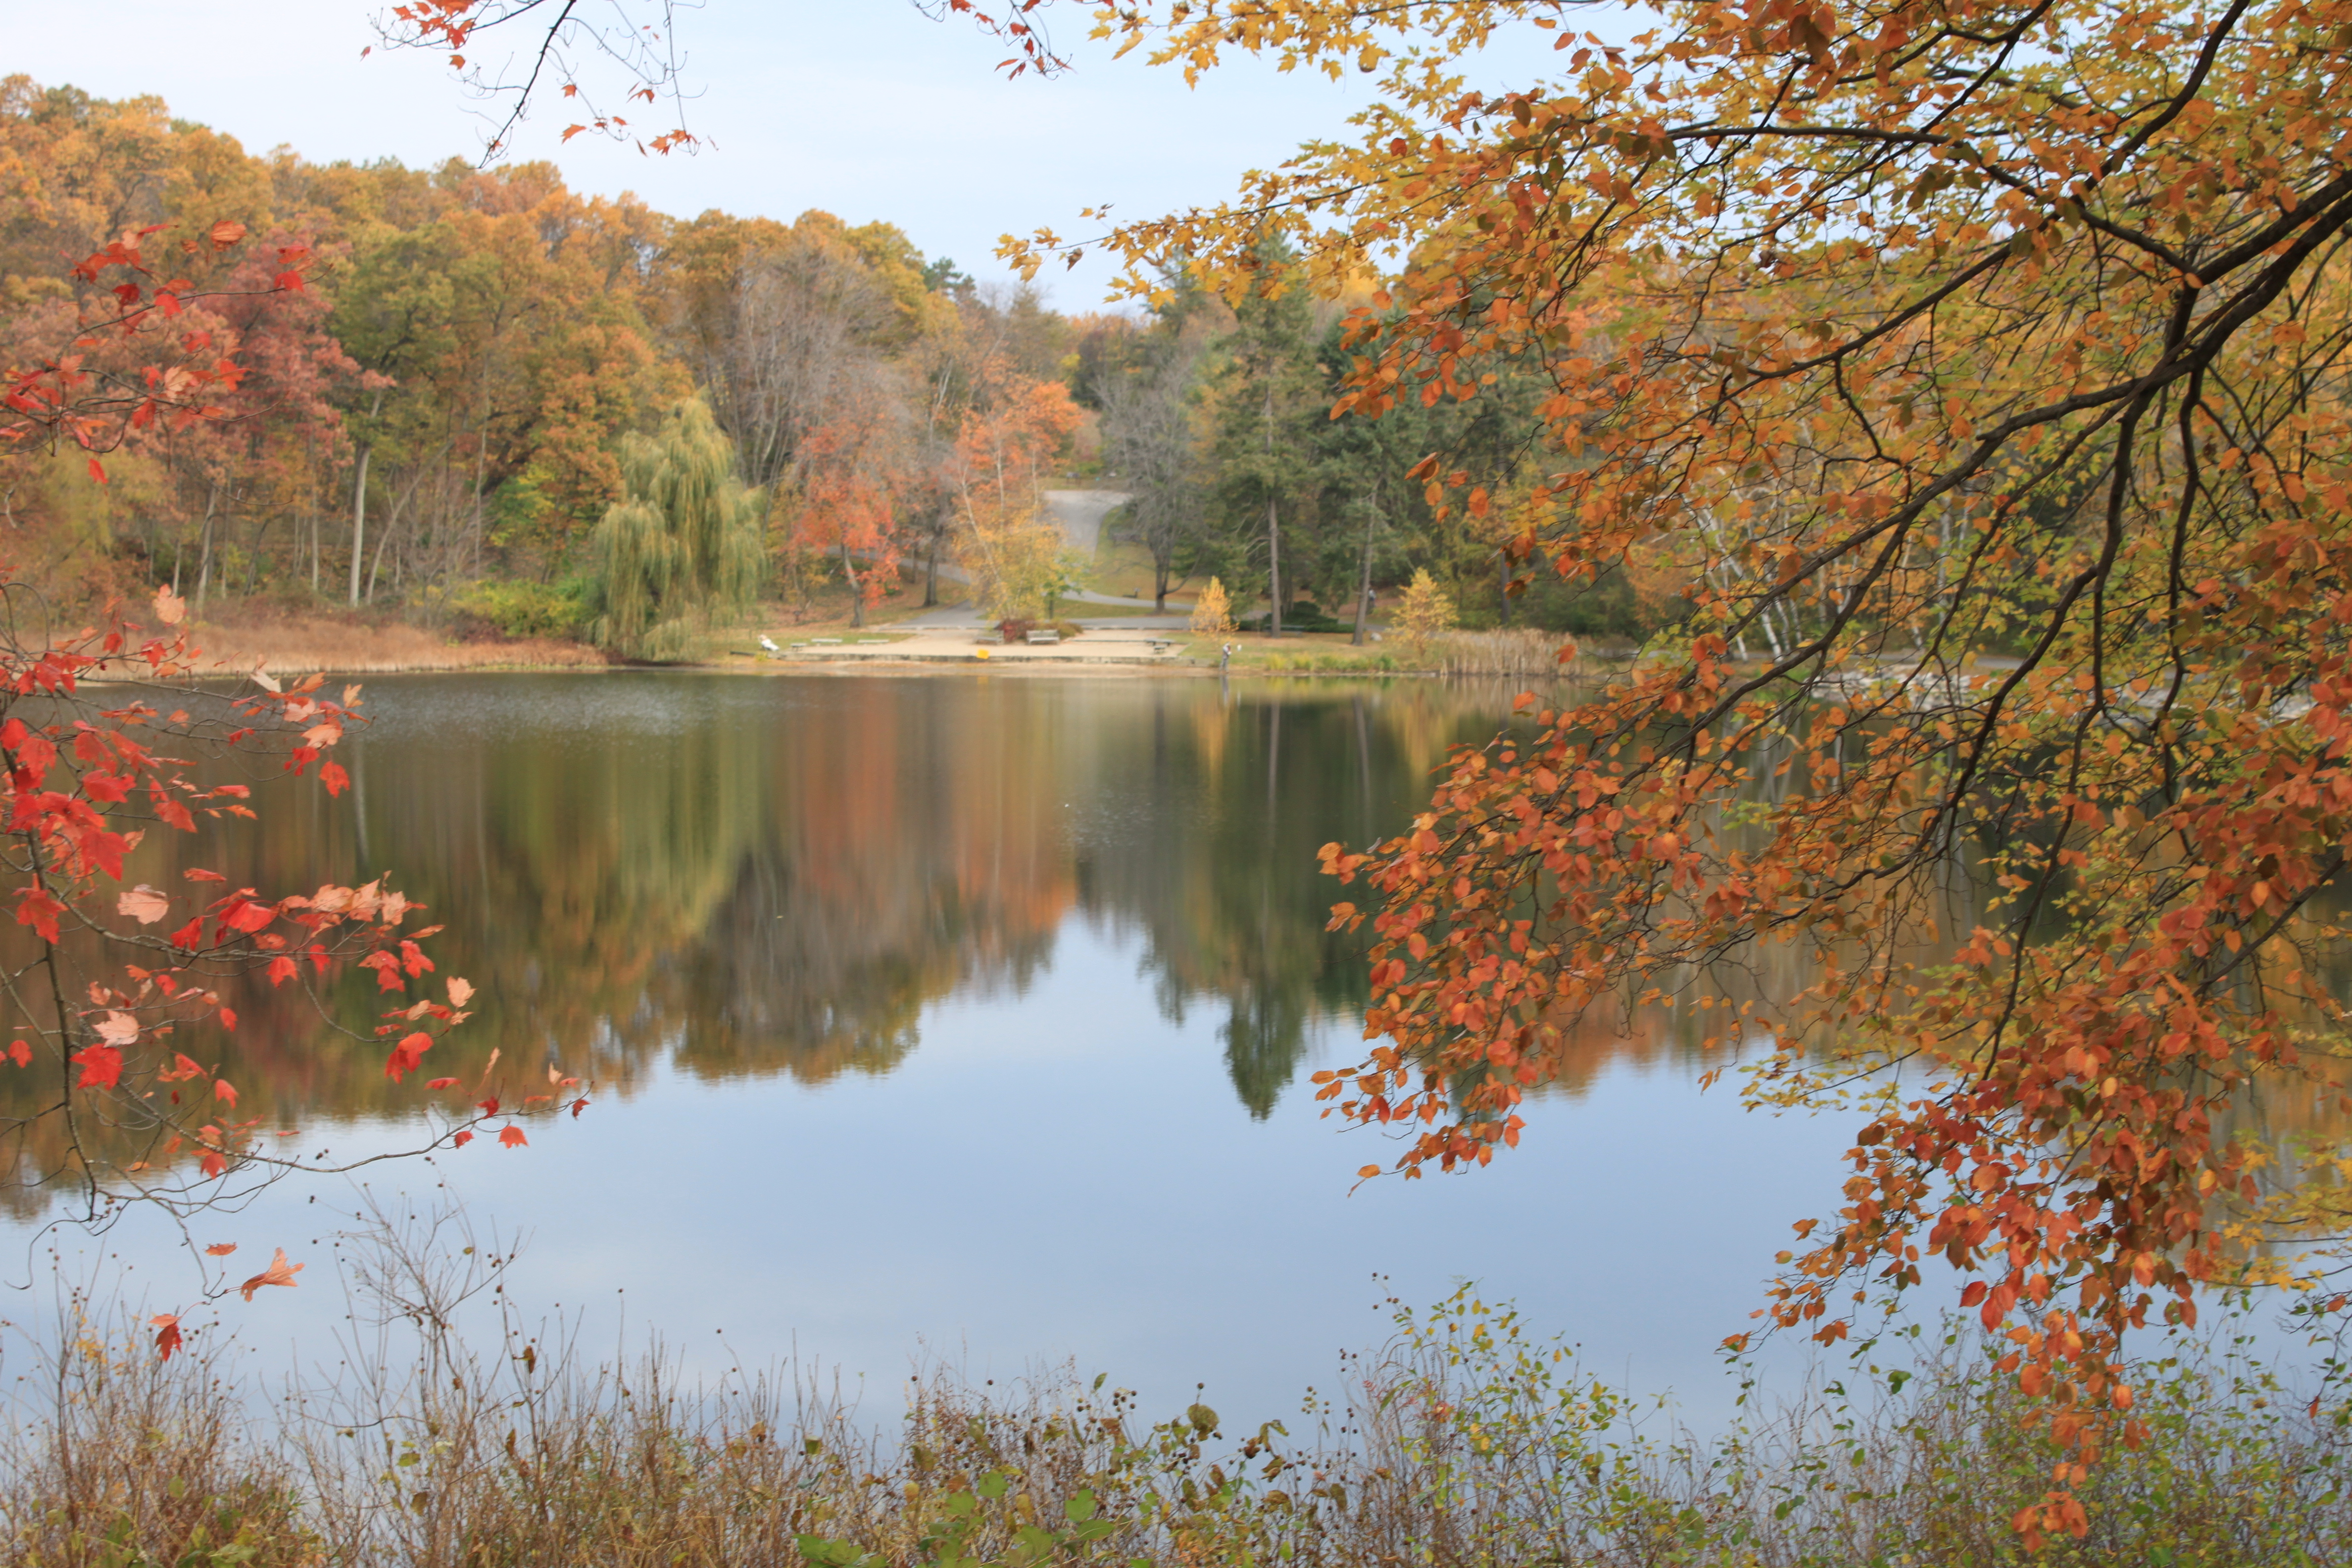 File:Hidden Lake in Hidden Lake Gardens Michigan.JPG - Wikimedia Commons